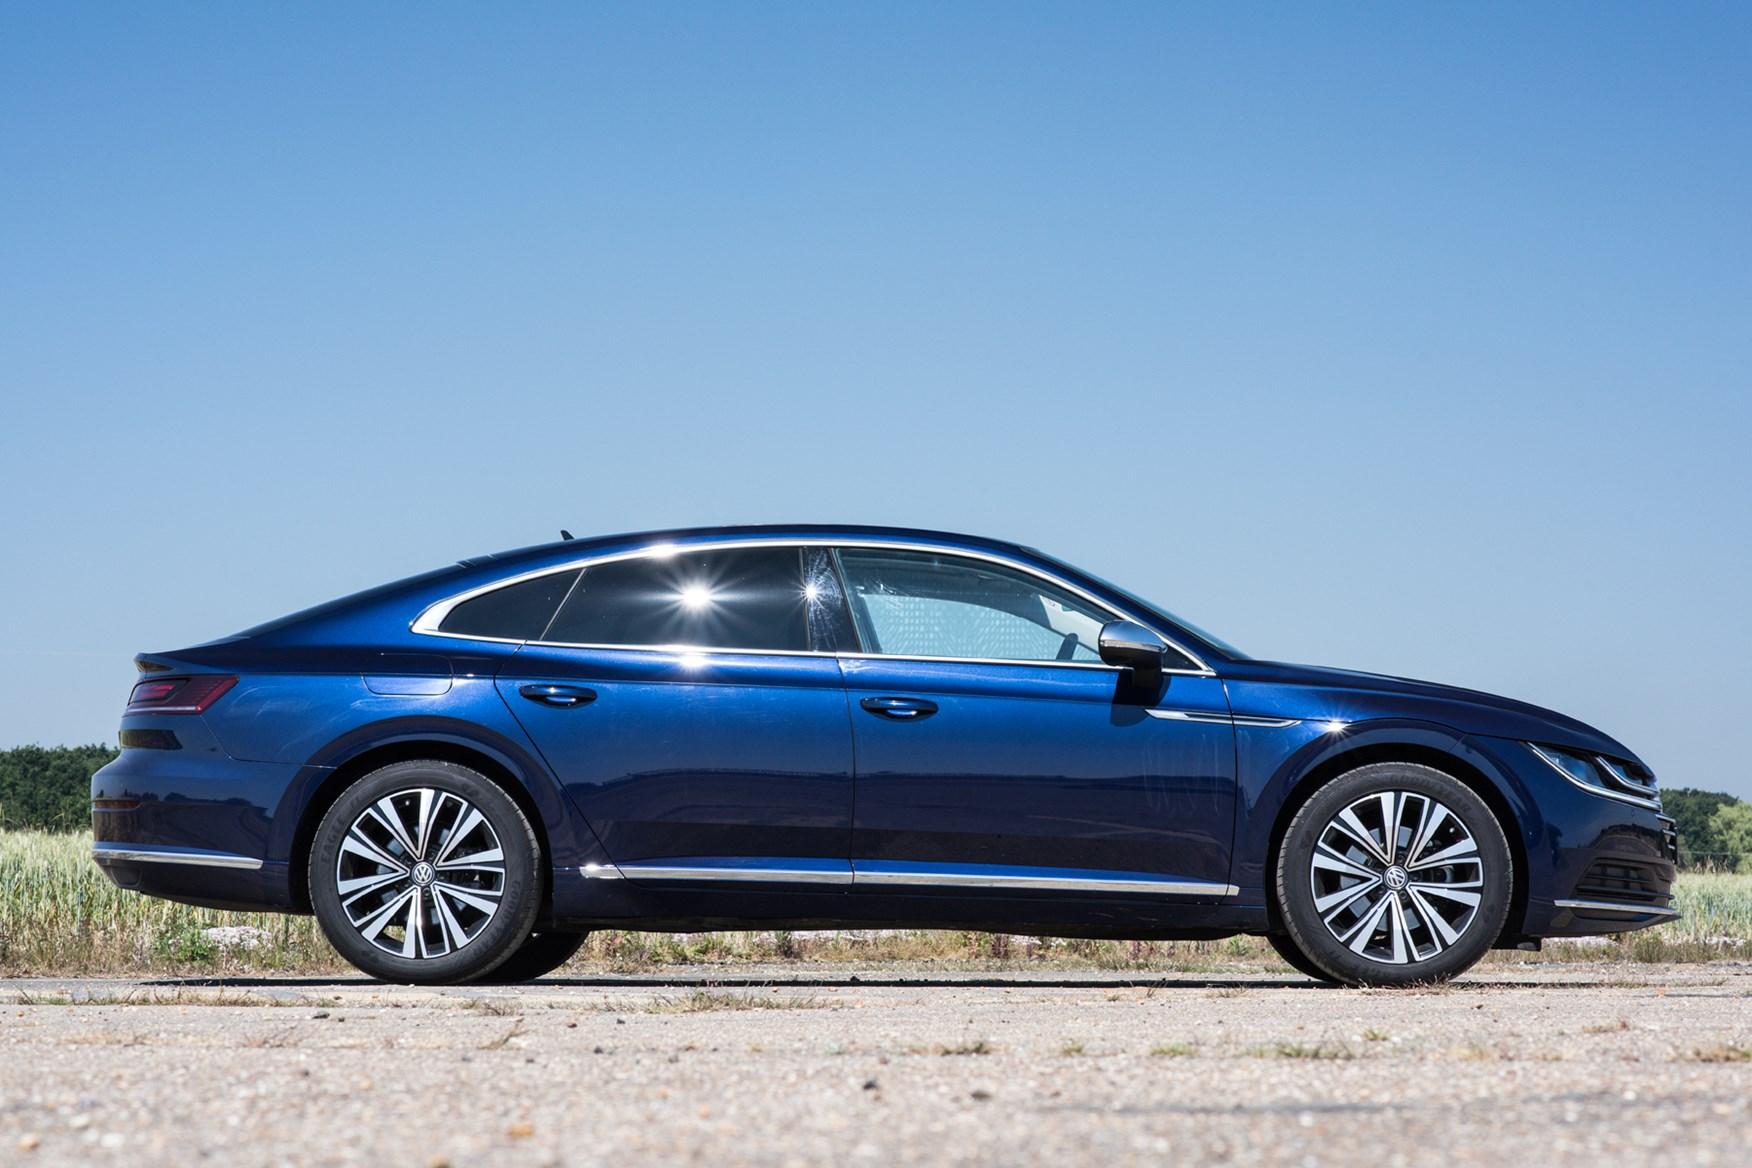 VW Arteon side profile